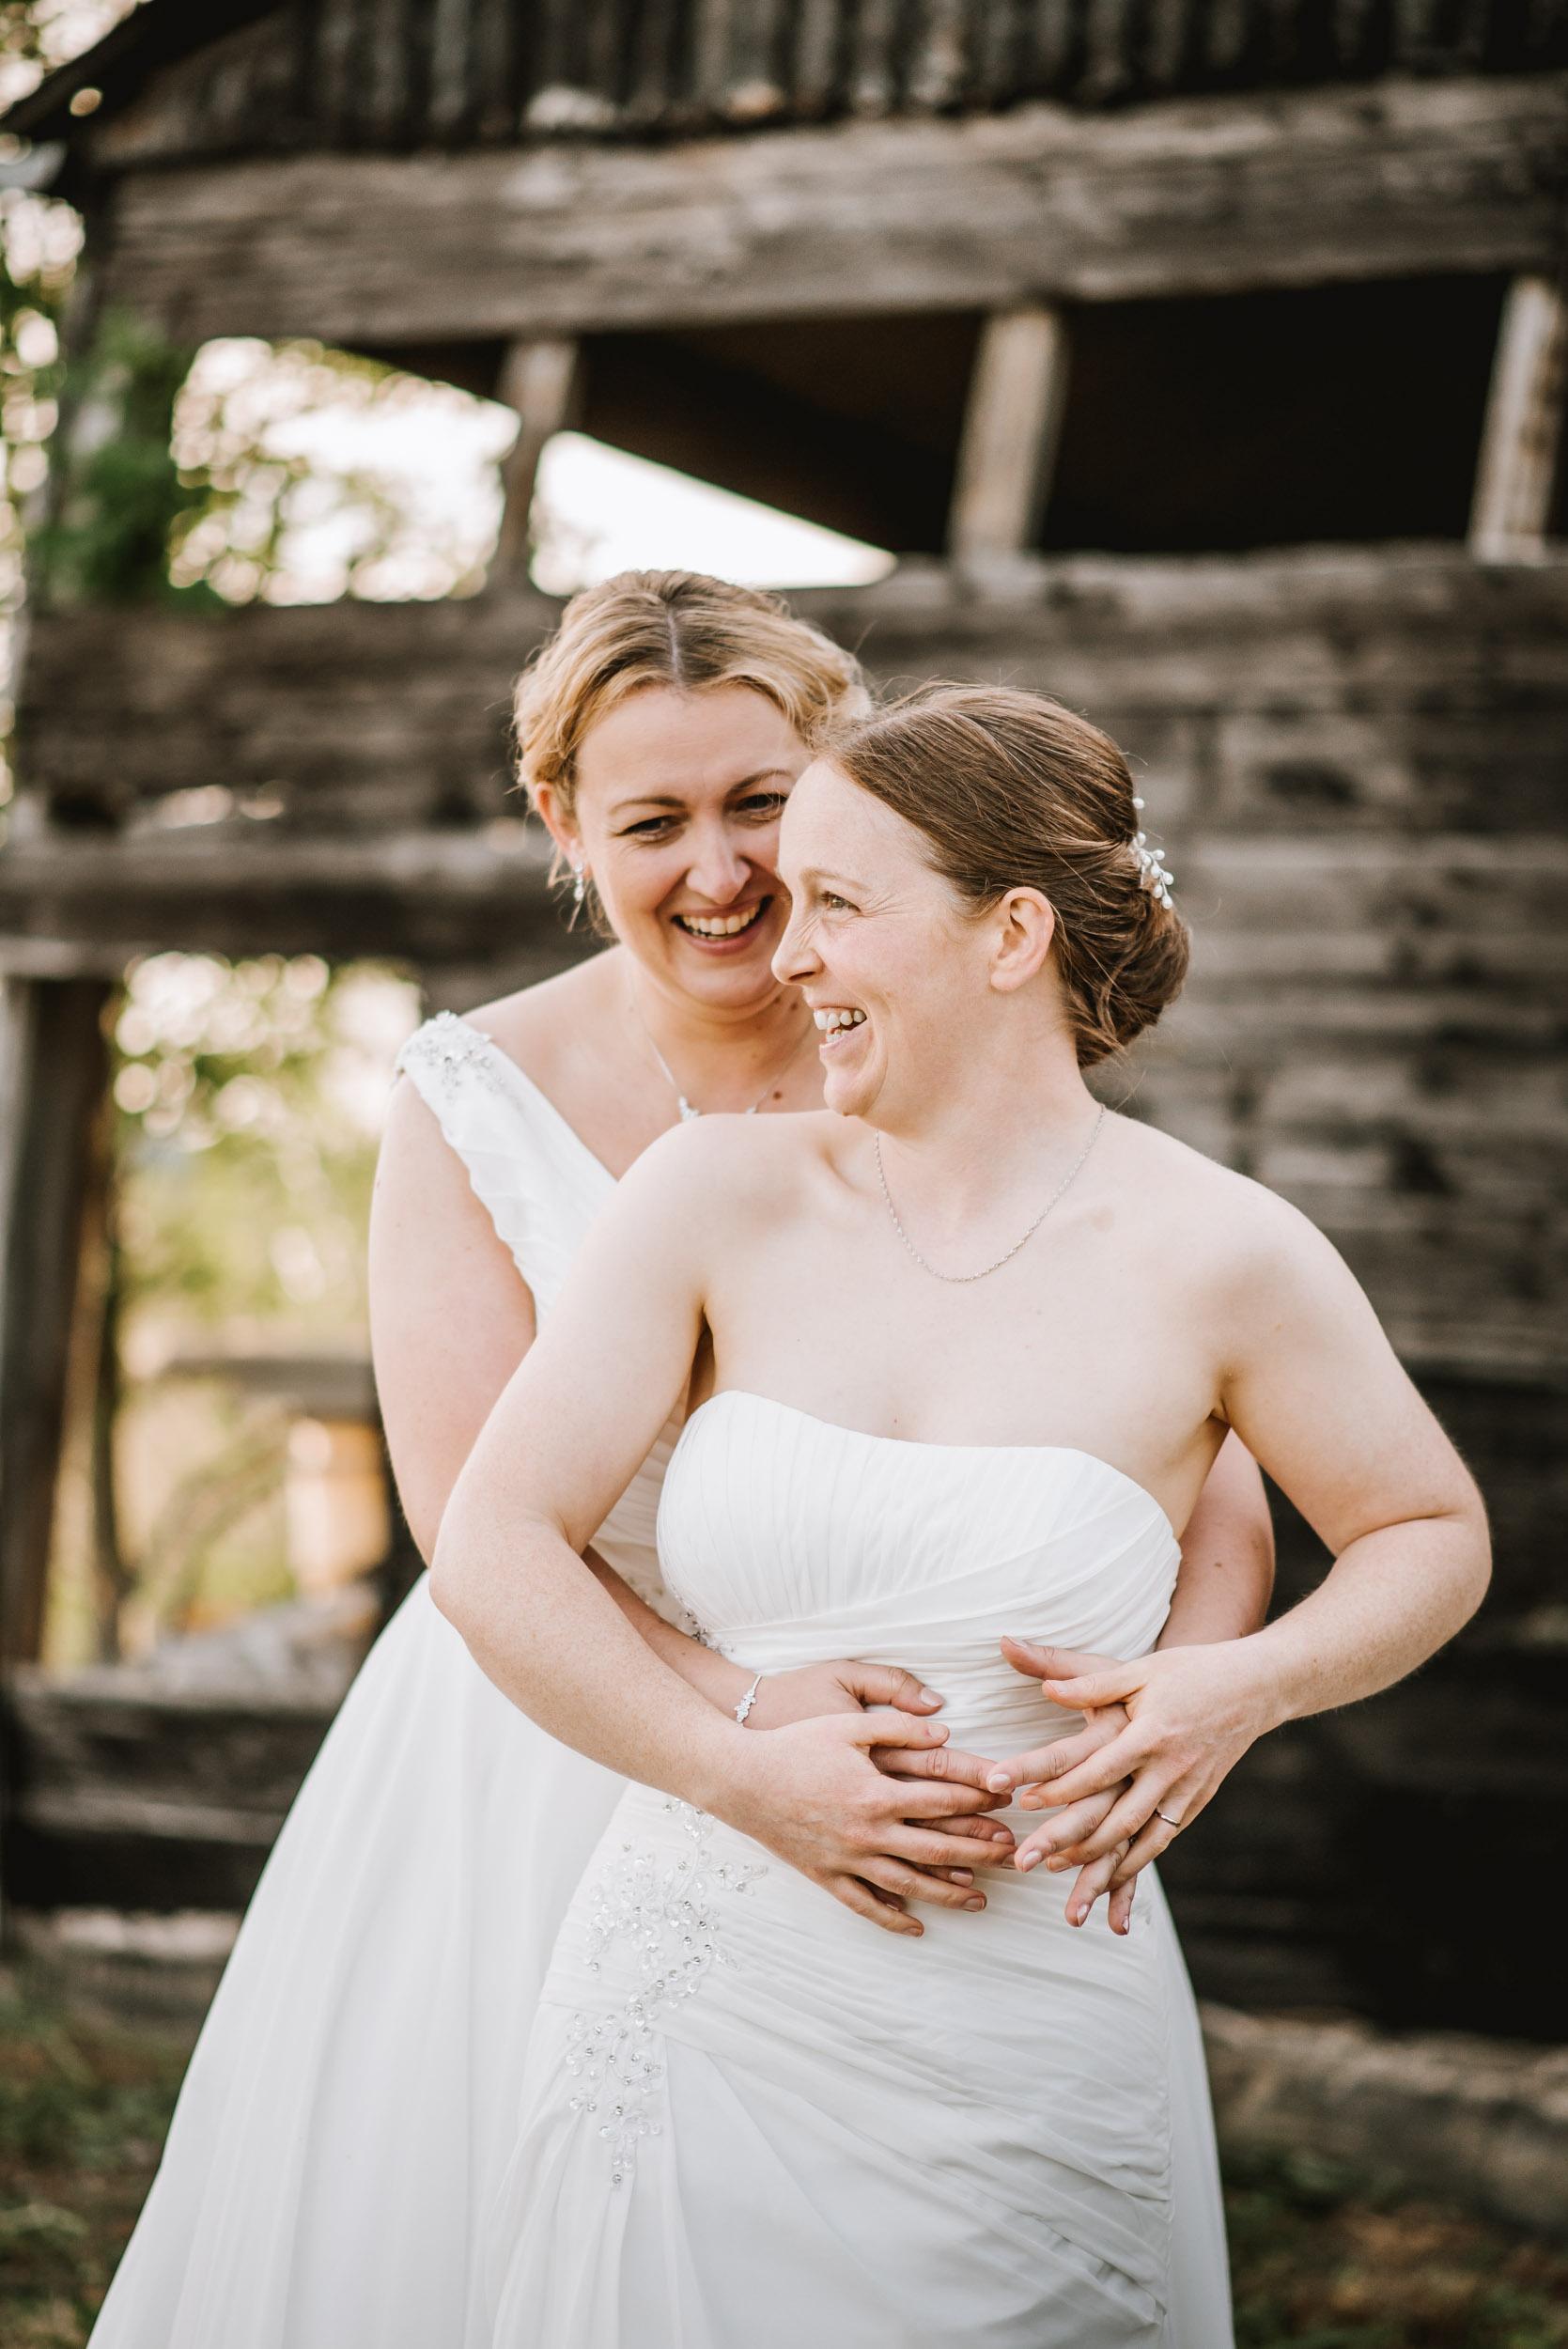 Donington-park-farm-wedding-photography-658.jpg